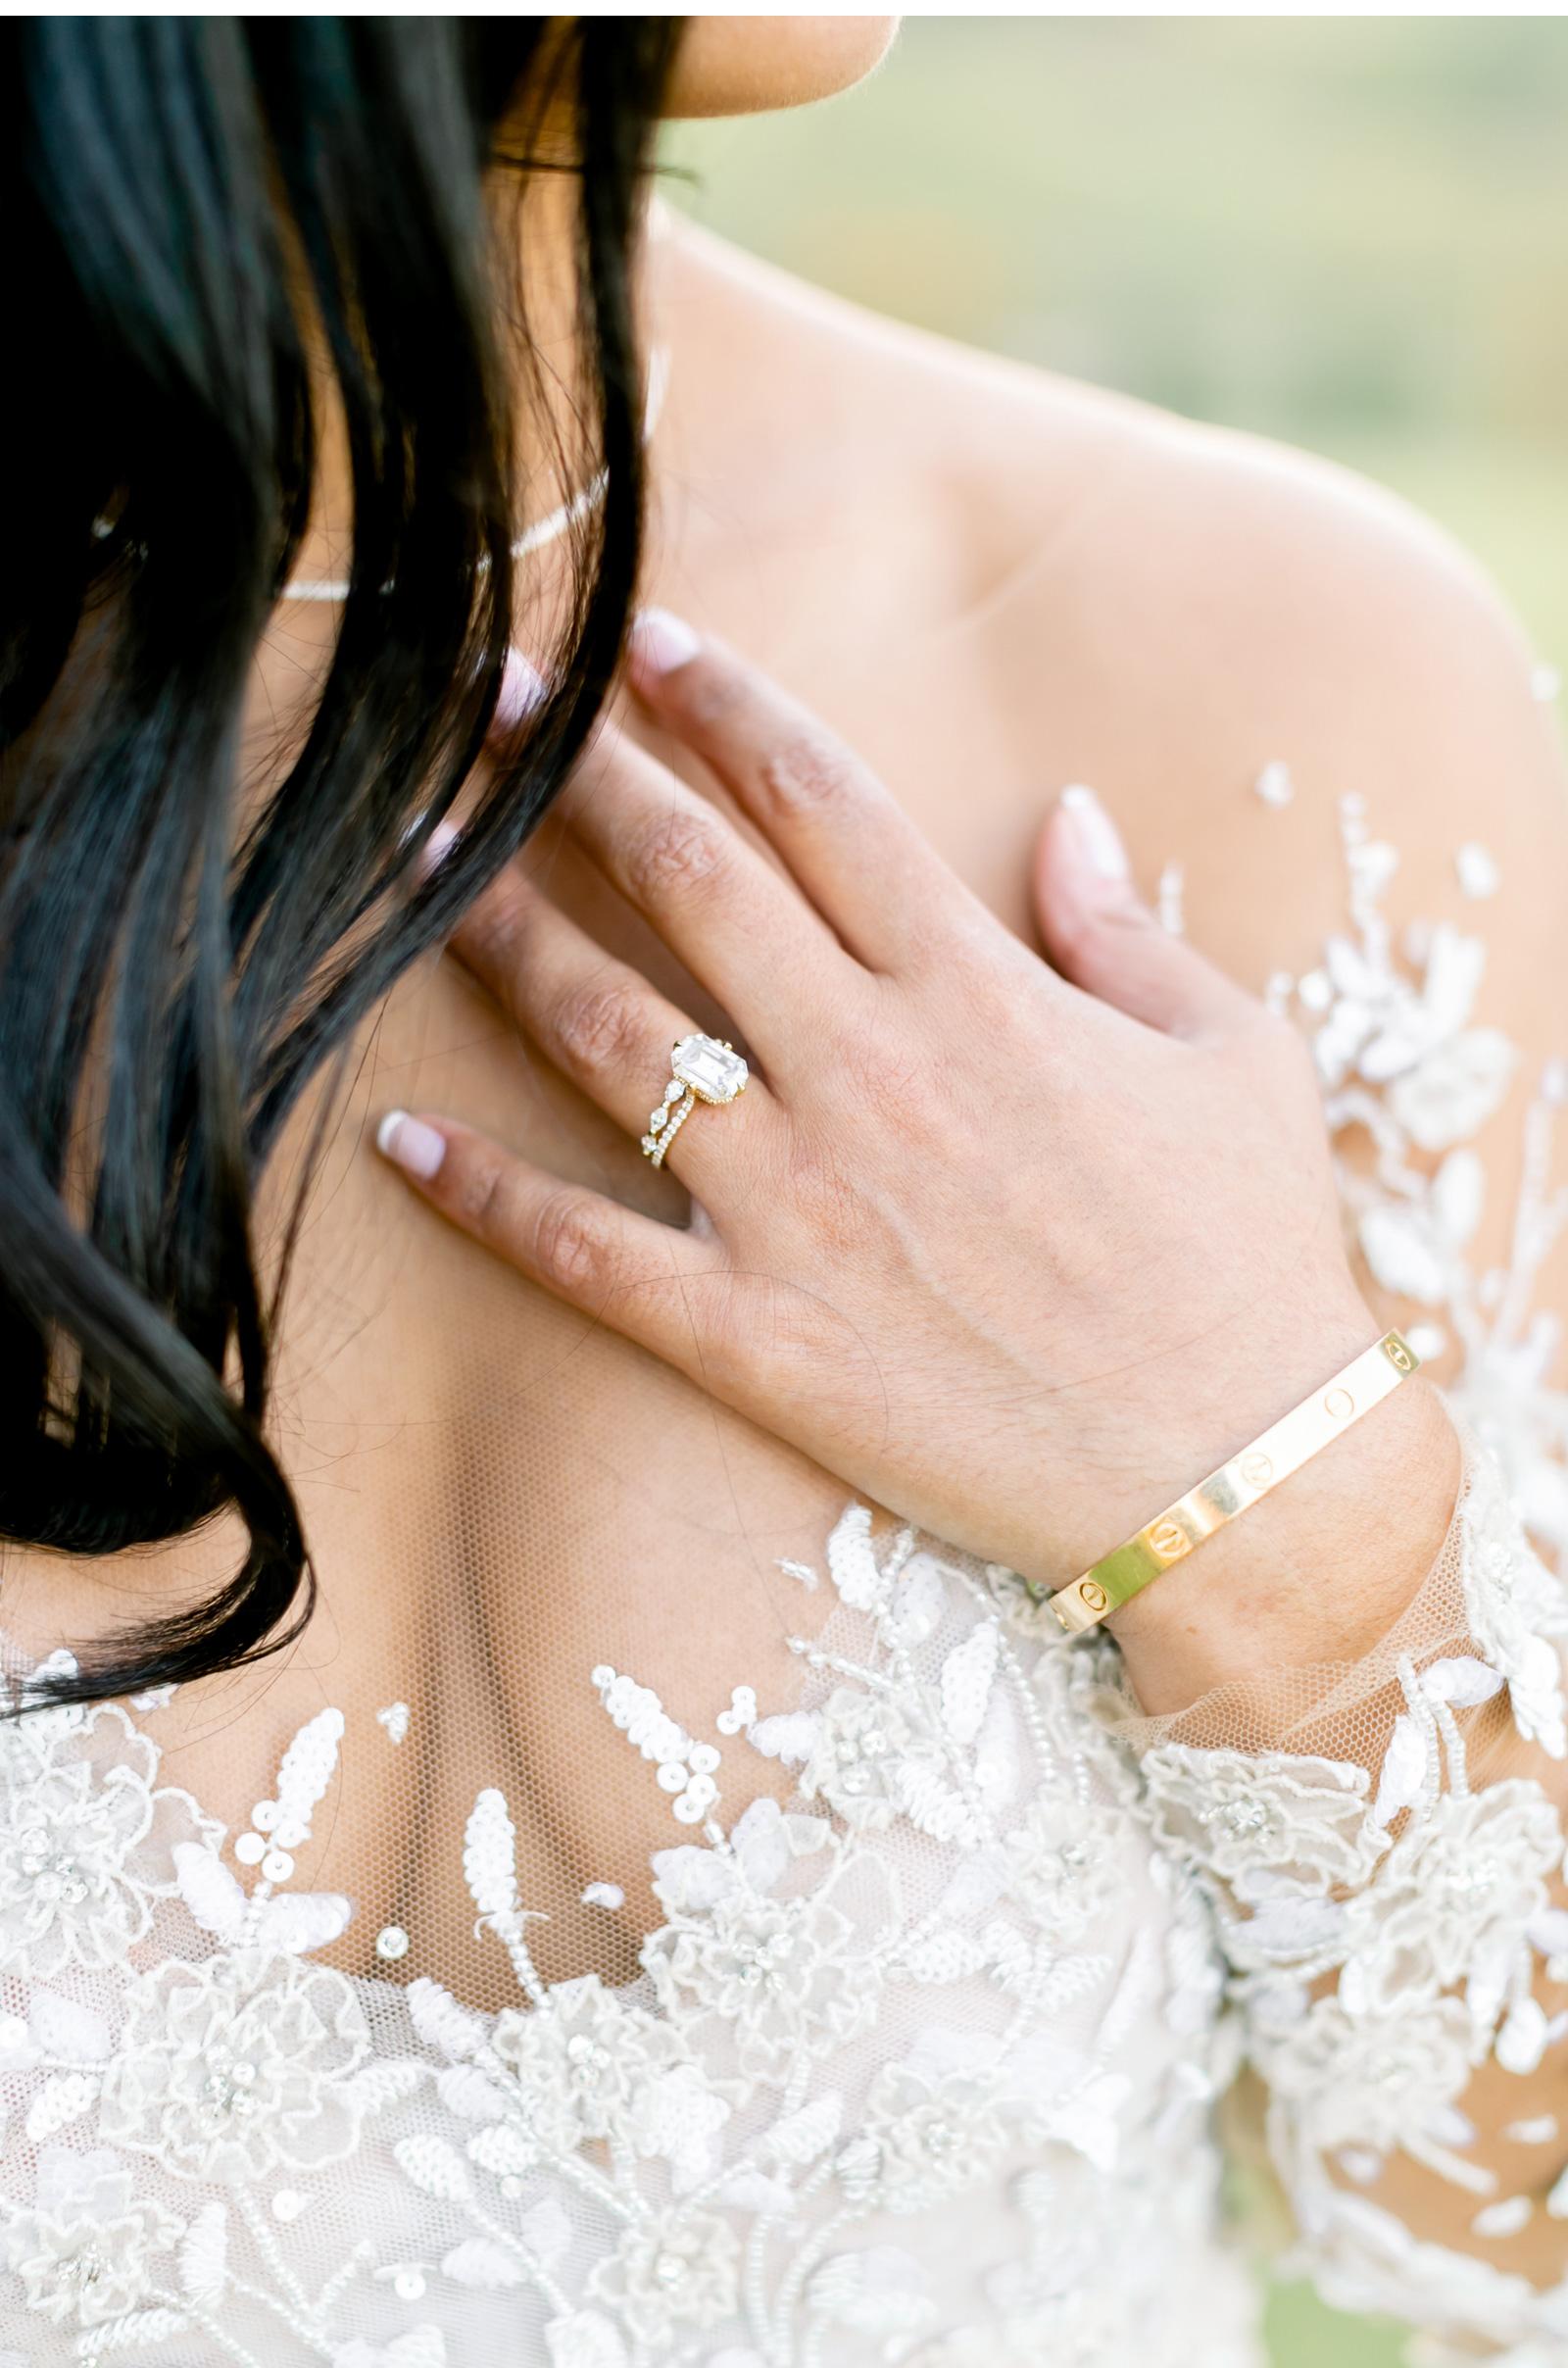 Malibu-Wedding-Photographer-Southern-California-Wedding-Venues-Malibu-Wedding-Photographer-Natalie-Schutt-Photography_09.jpg